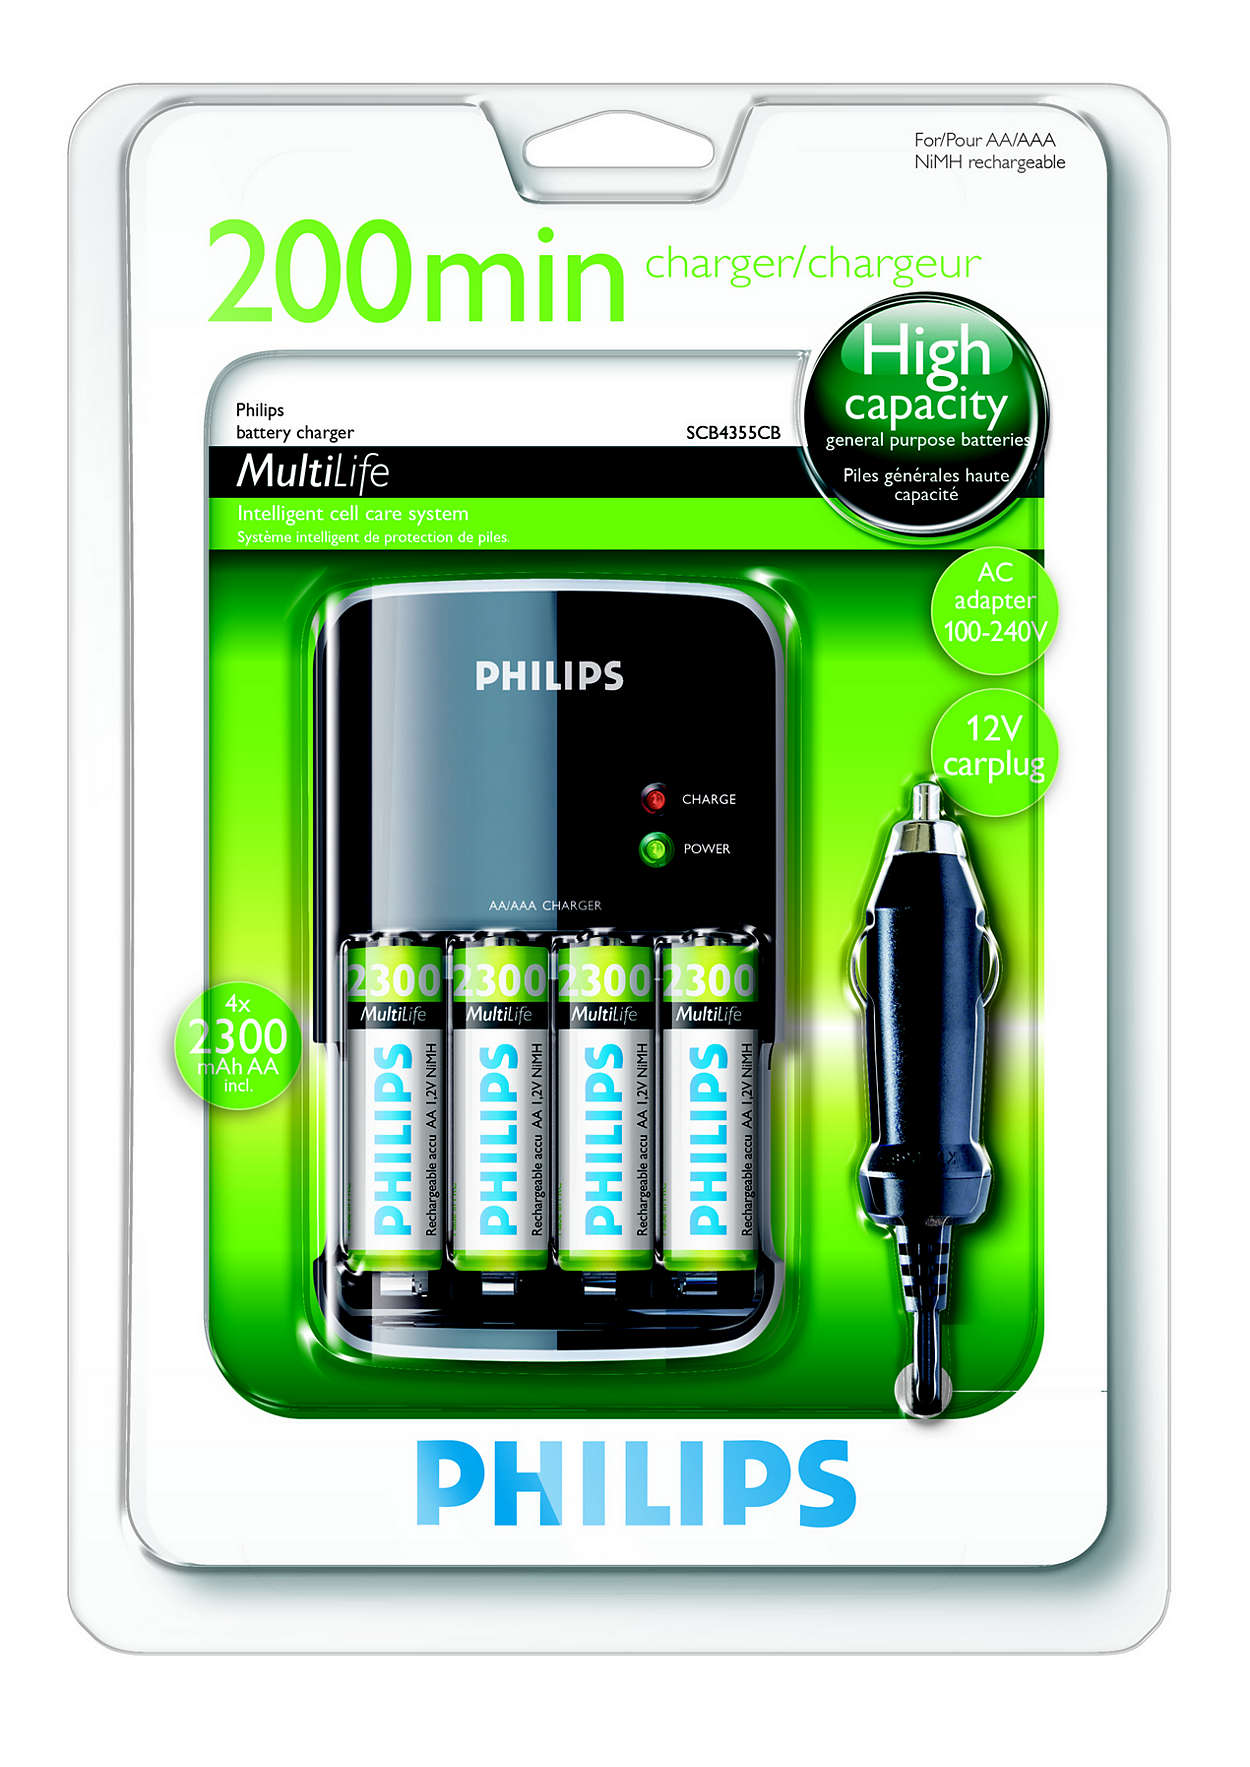 Полная зарядка аккумуляторов за 200 минут